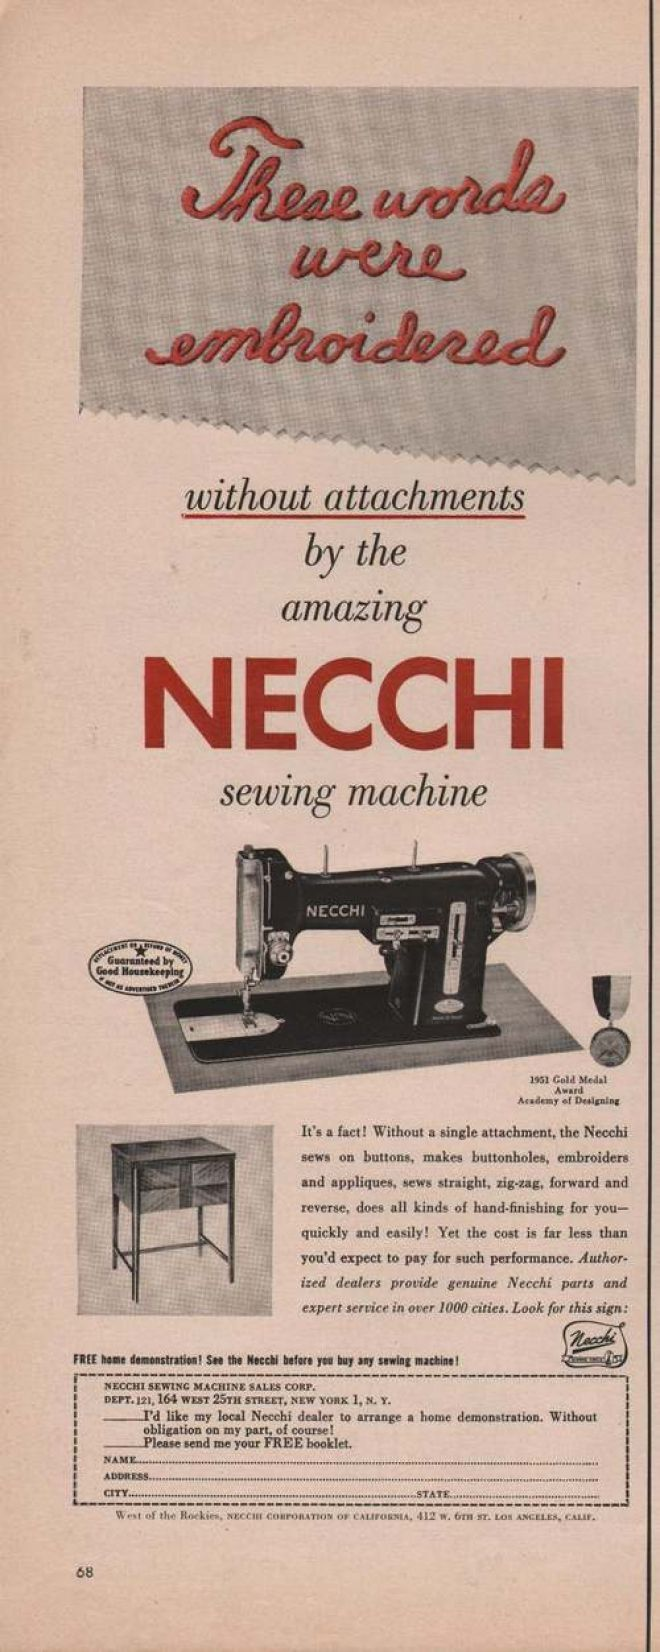 Necchi Sewing Machine 1951 Vintage Ads Pinterest Bu Threading Diagram